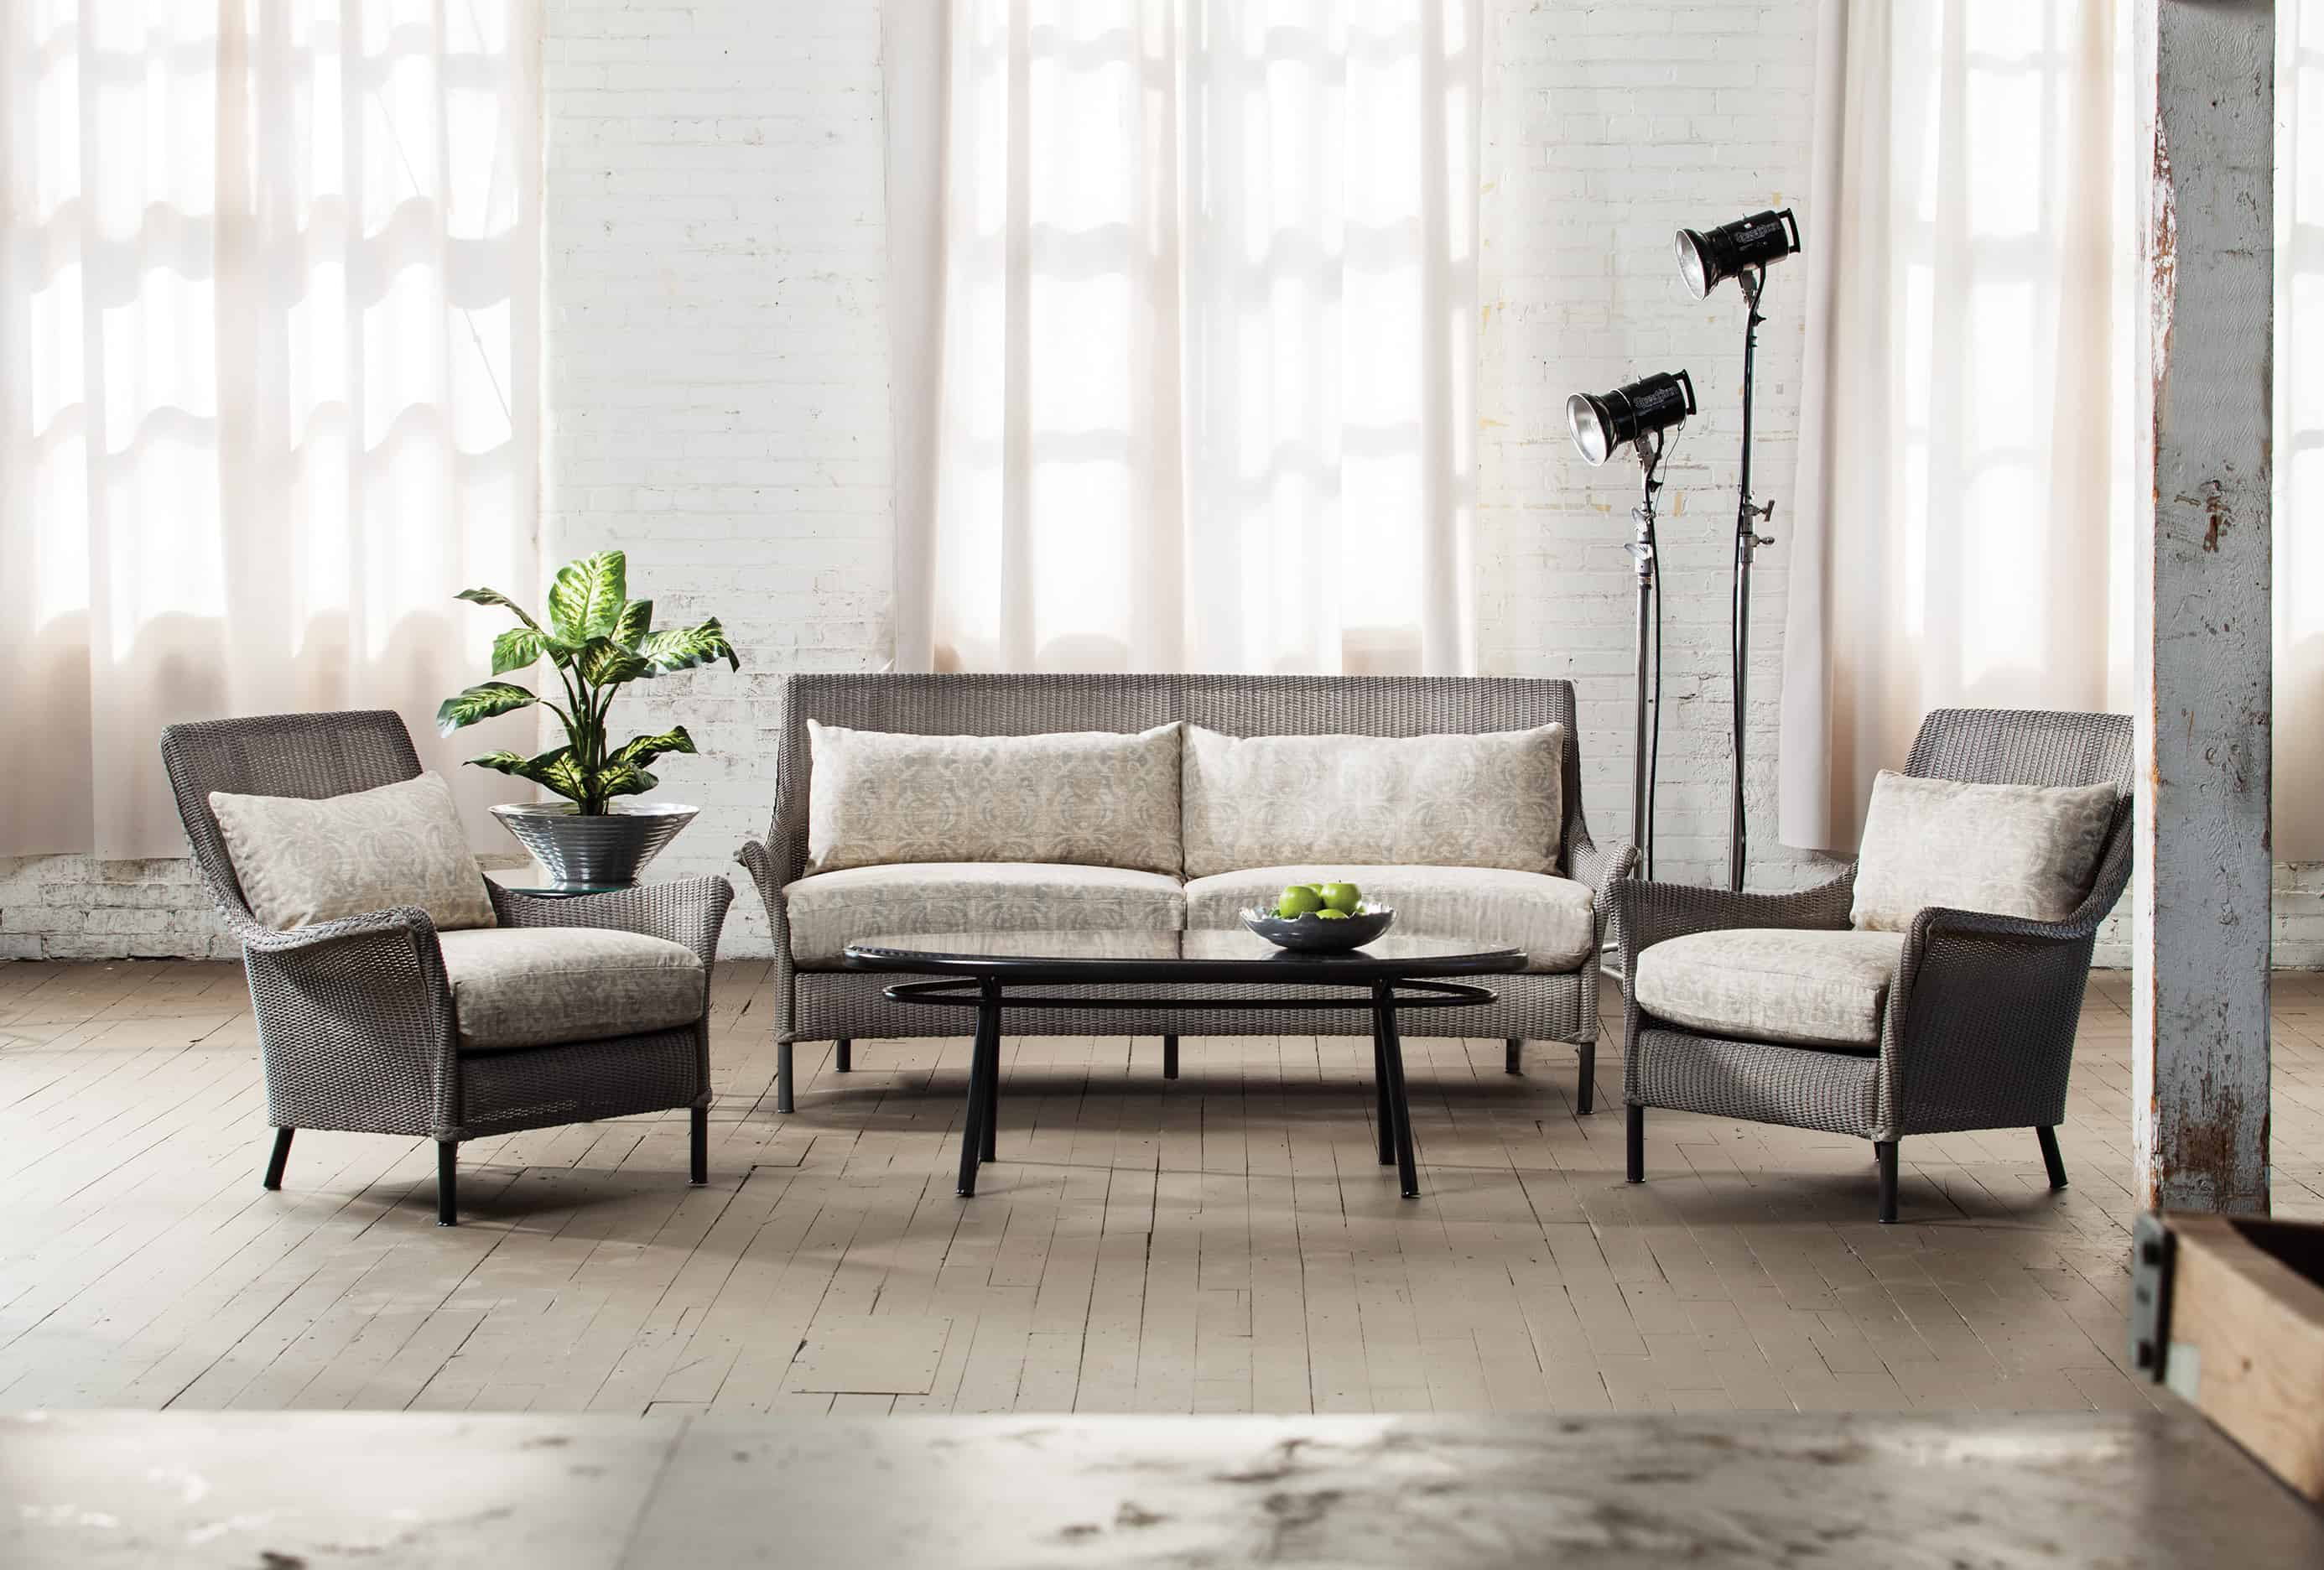 summer-home-furniture-summer-home-furniture-summer-house-furnishings-seacoast-new-hampshires-on-furniture